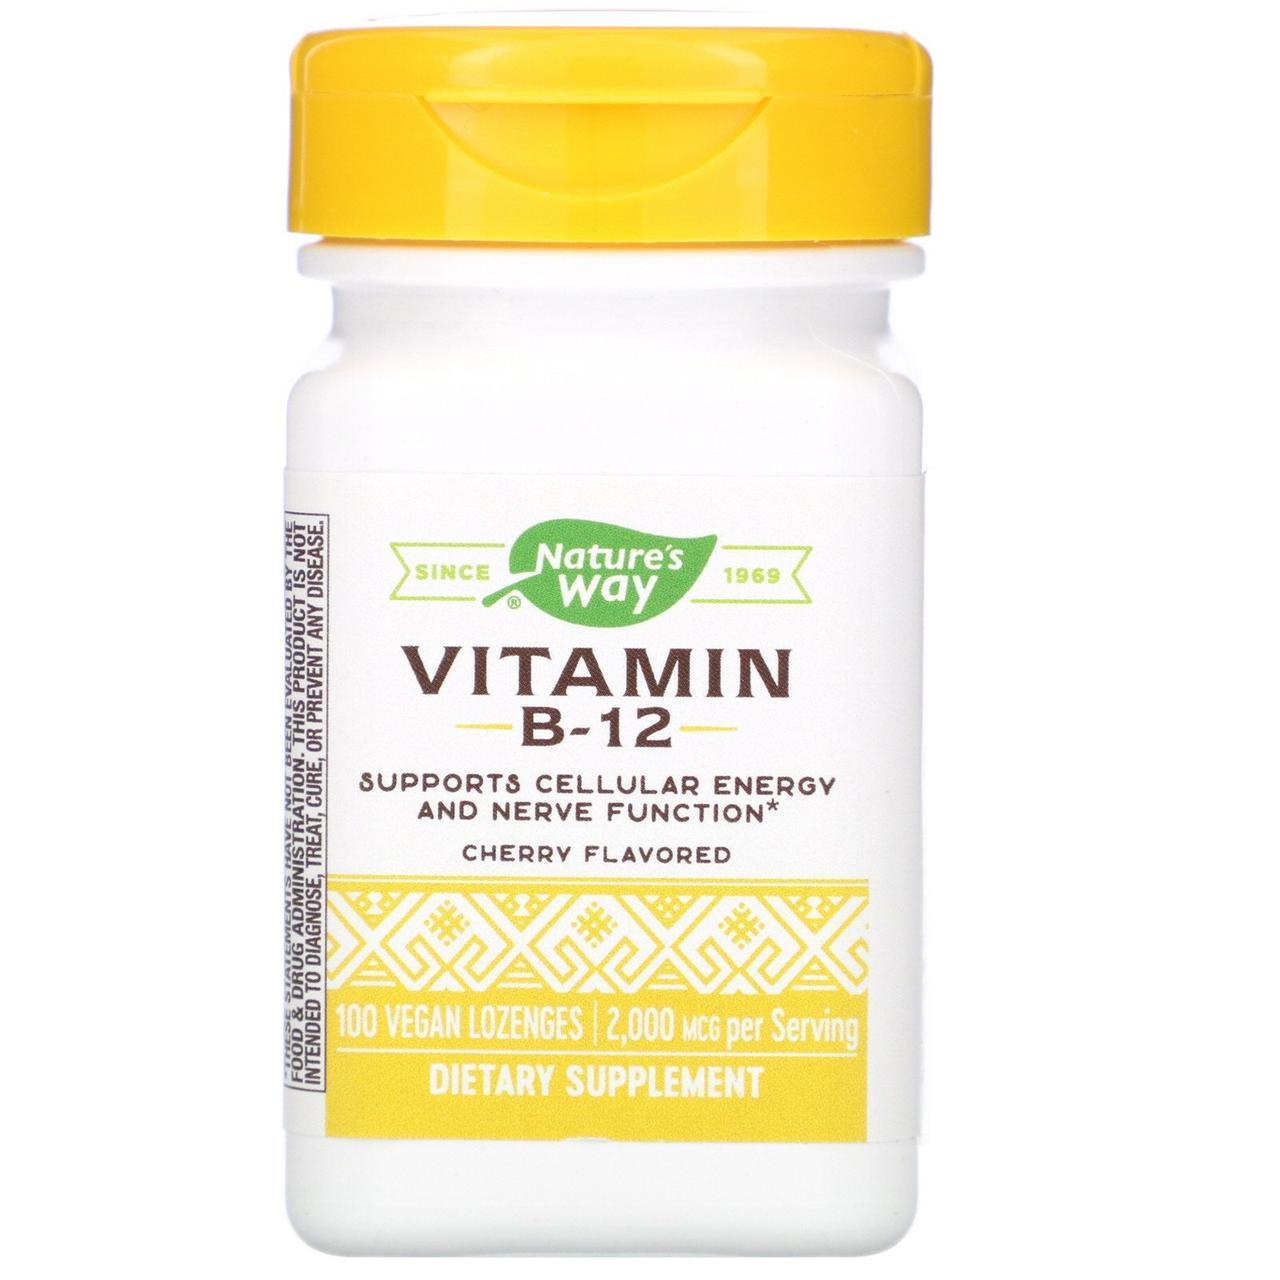 Витамин В12, Vitamin B-12, Nature's Way, 100 таб.